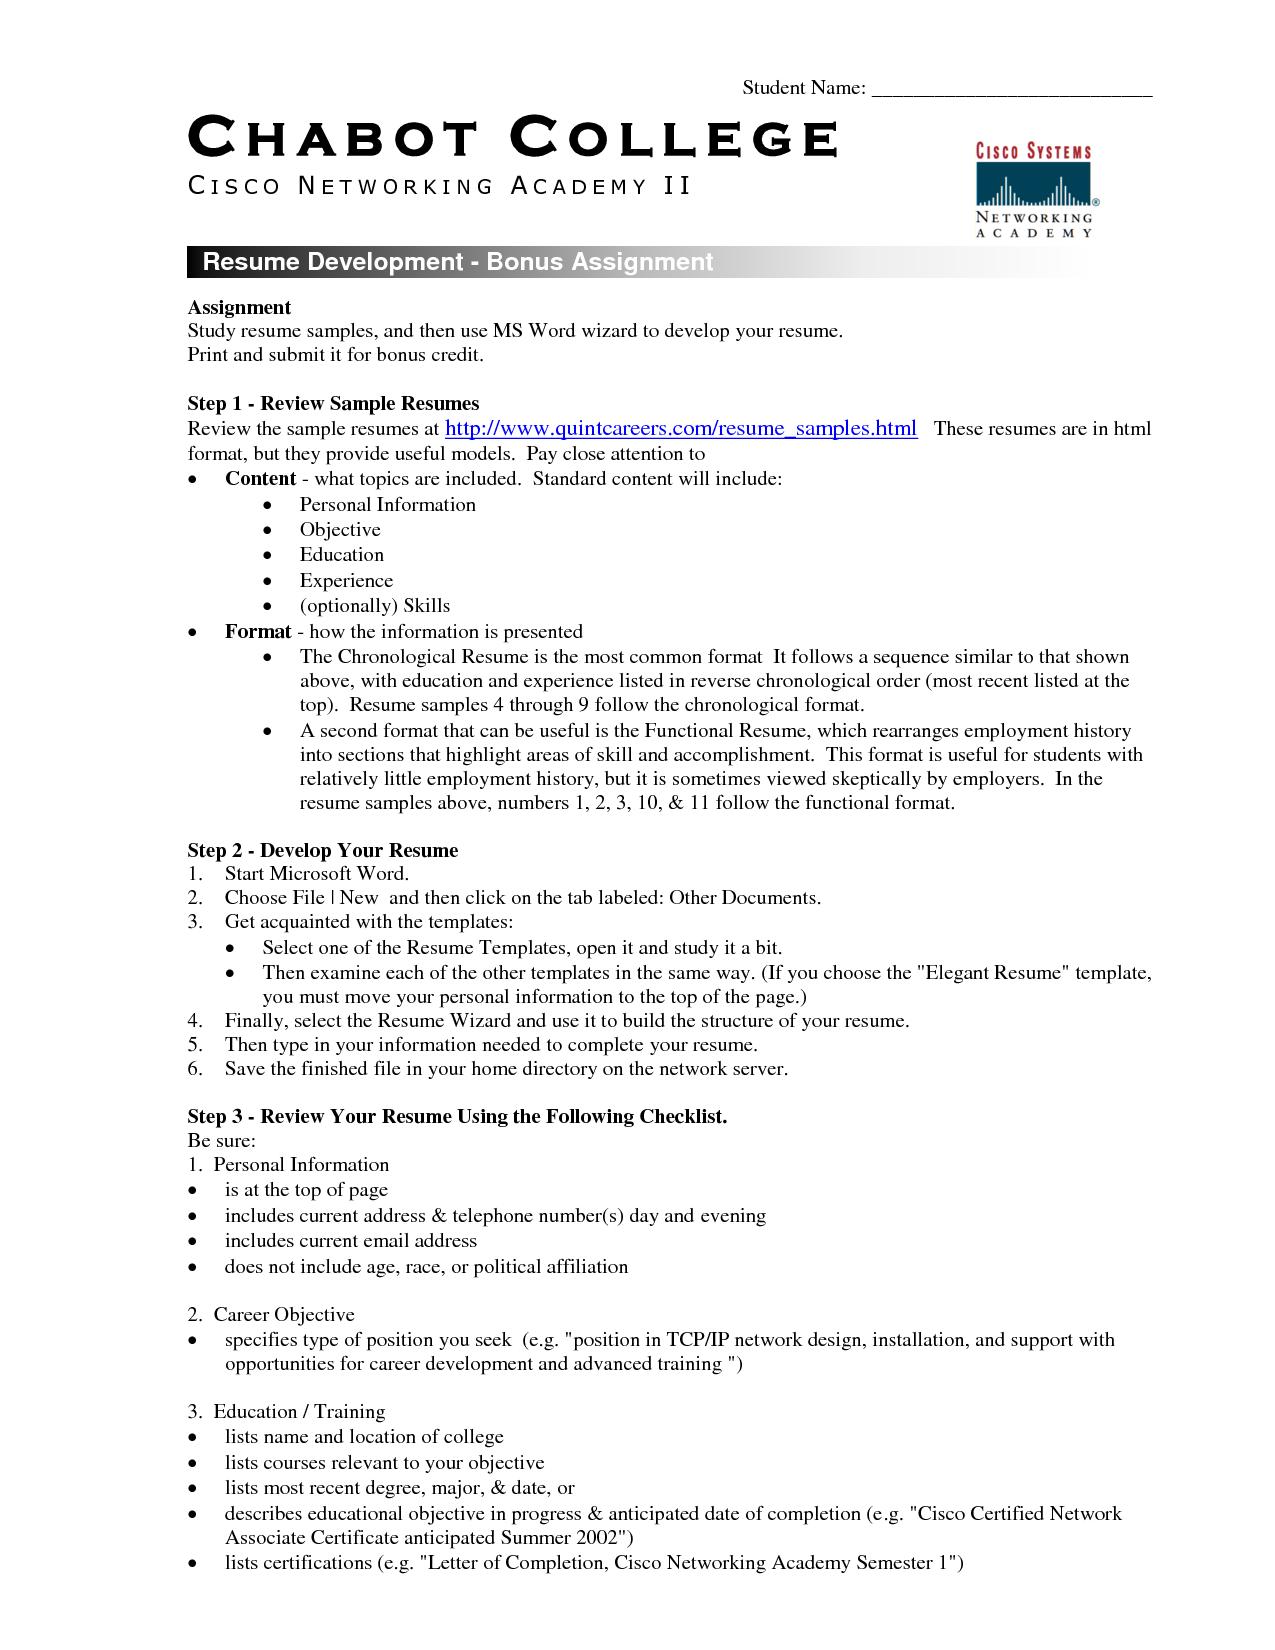 Resume Examples Reddit Resume Templates Student Resume Template Microsoft Word Resume Template Resume Words